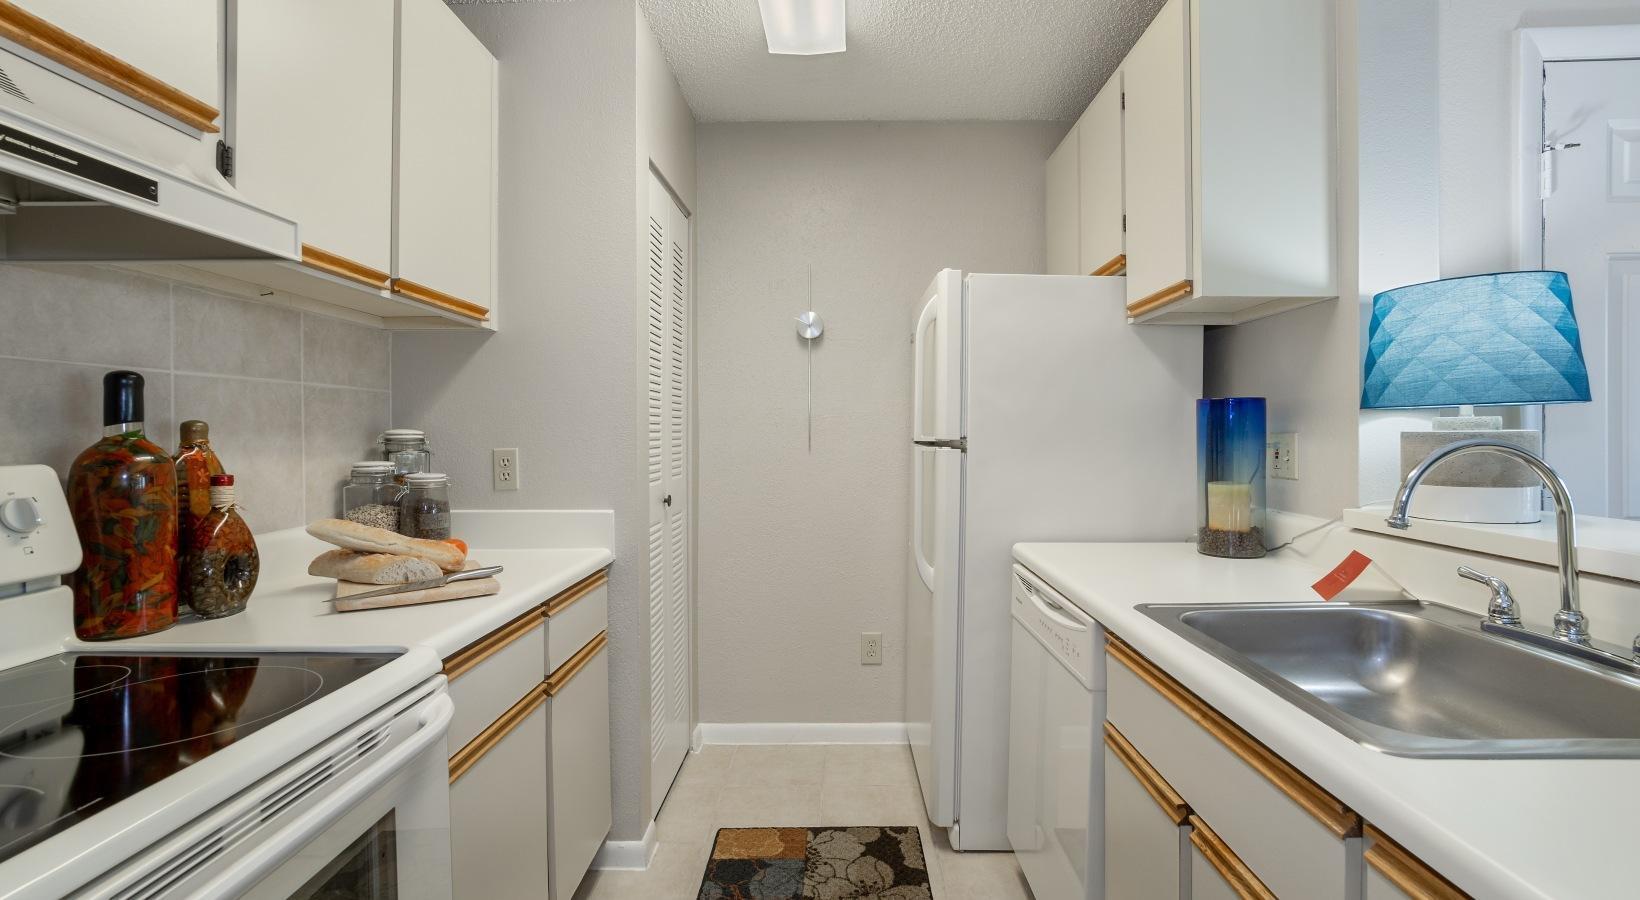 520 Terraceview Cove #19-305, Altamonte Springs, FL - 2,127 USD/ month